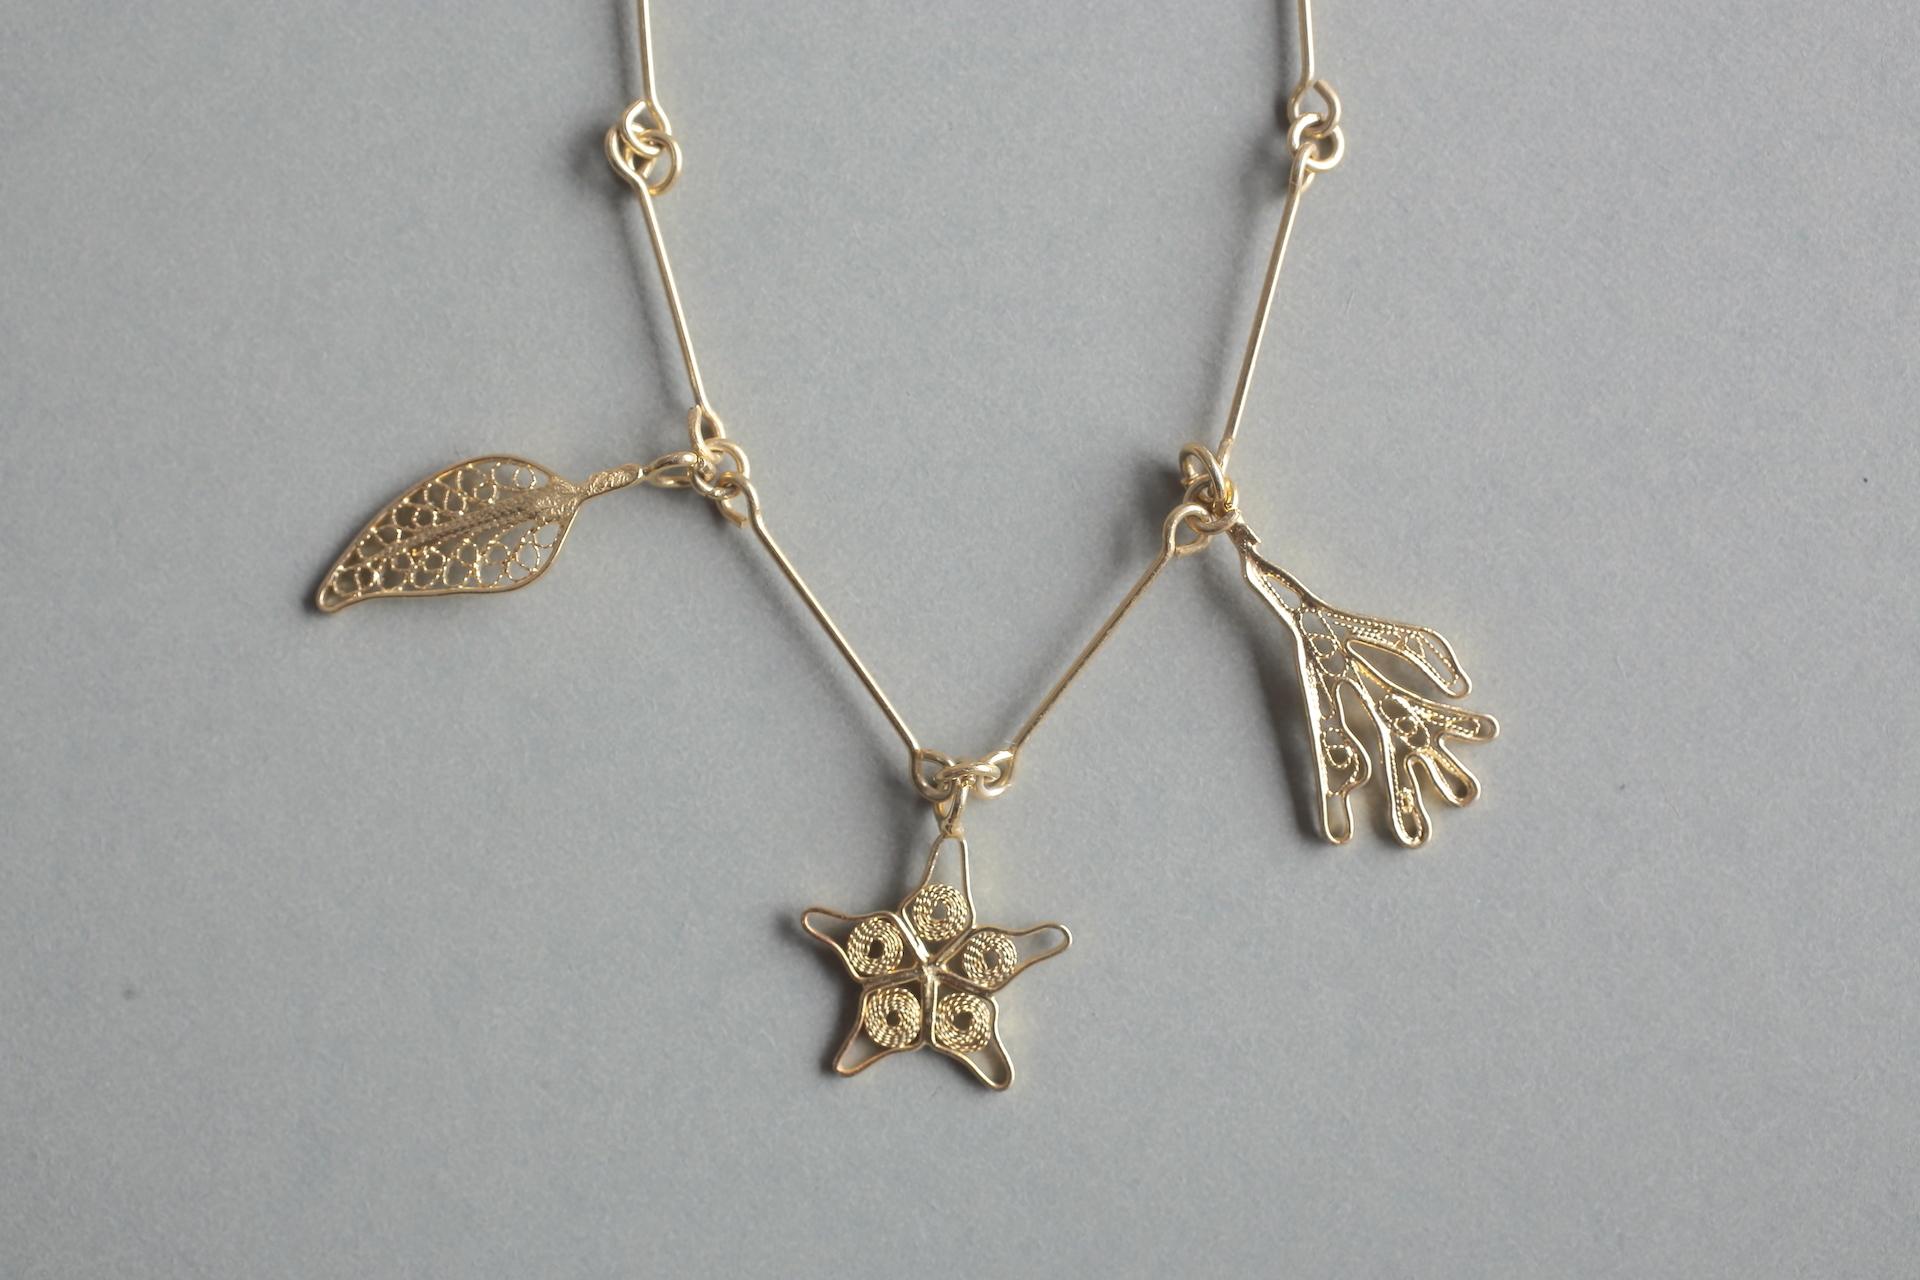 Suzushiro(清白) - Bracelet / Gold